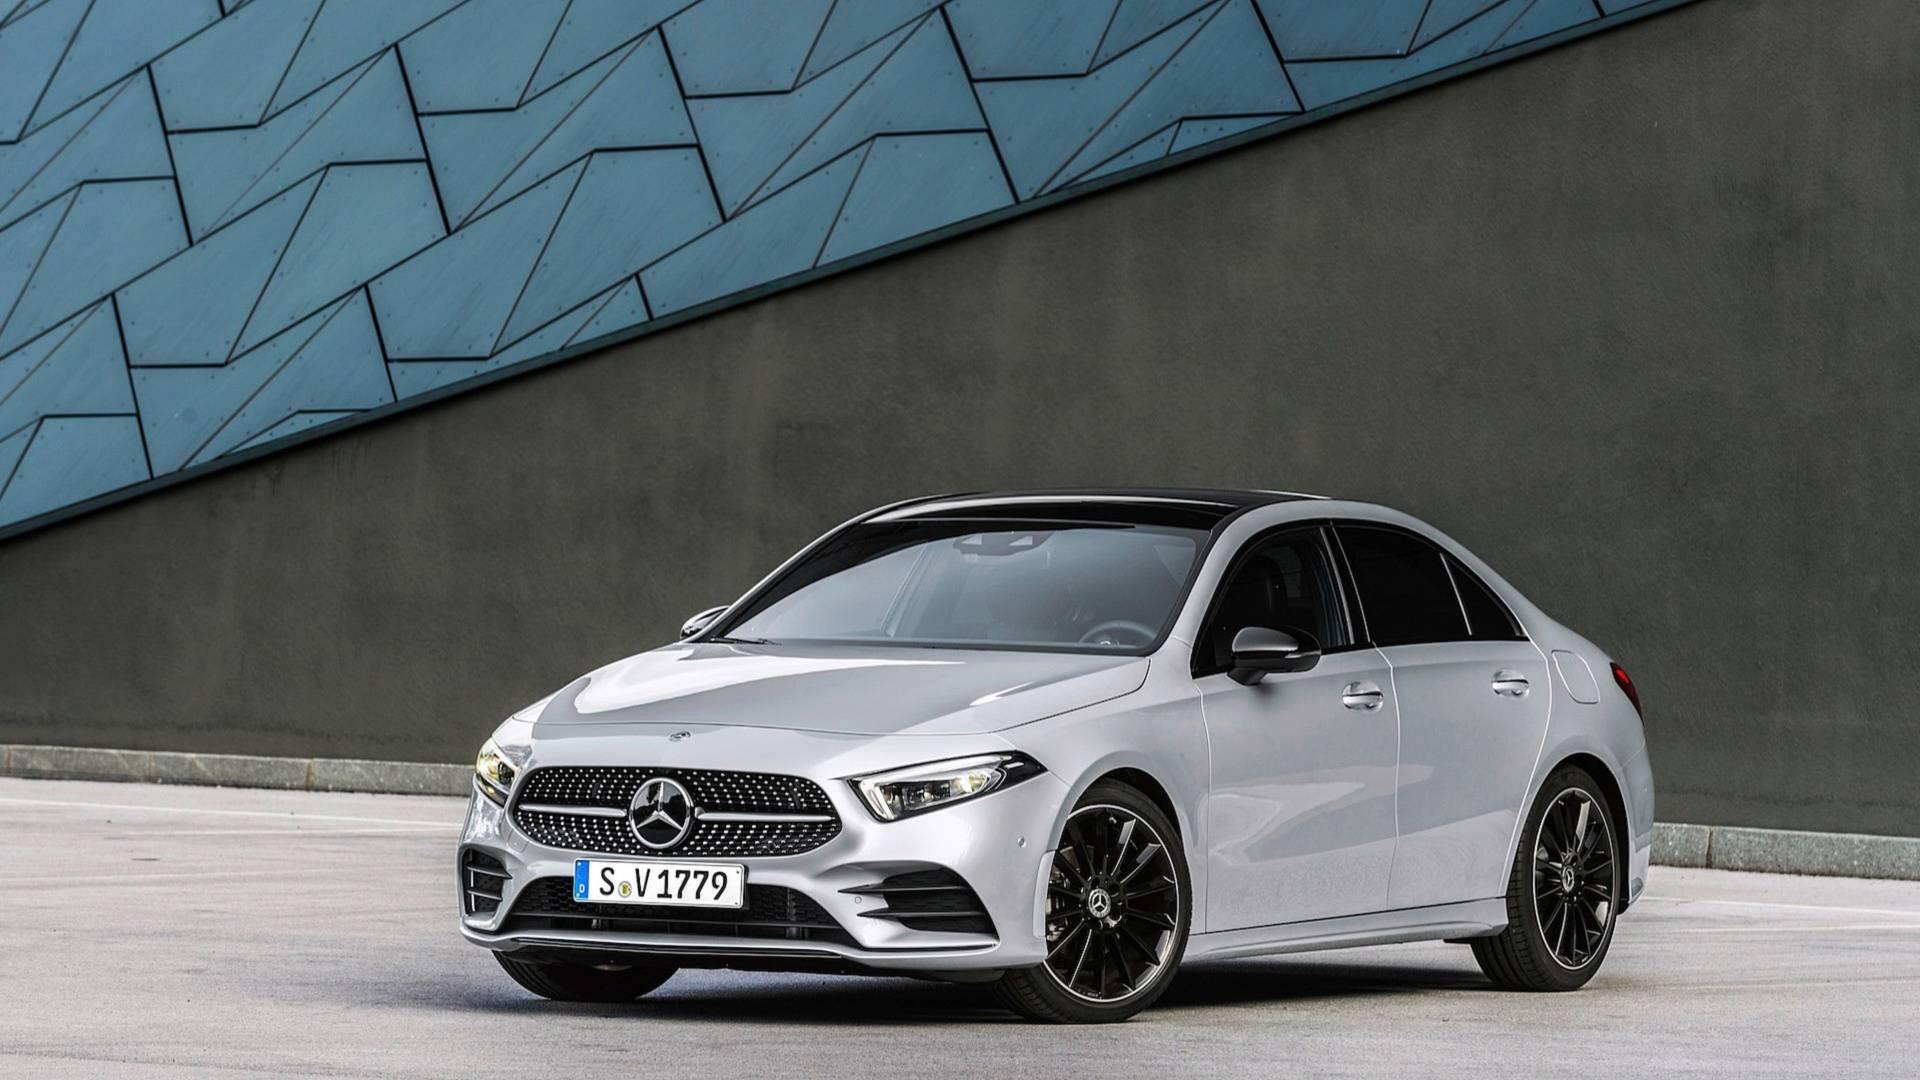 2019 mercedes benz a class sedan v177 is far more elegant than hatchback autoevolution